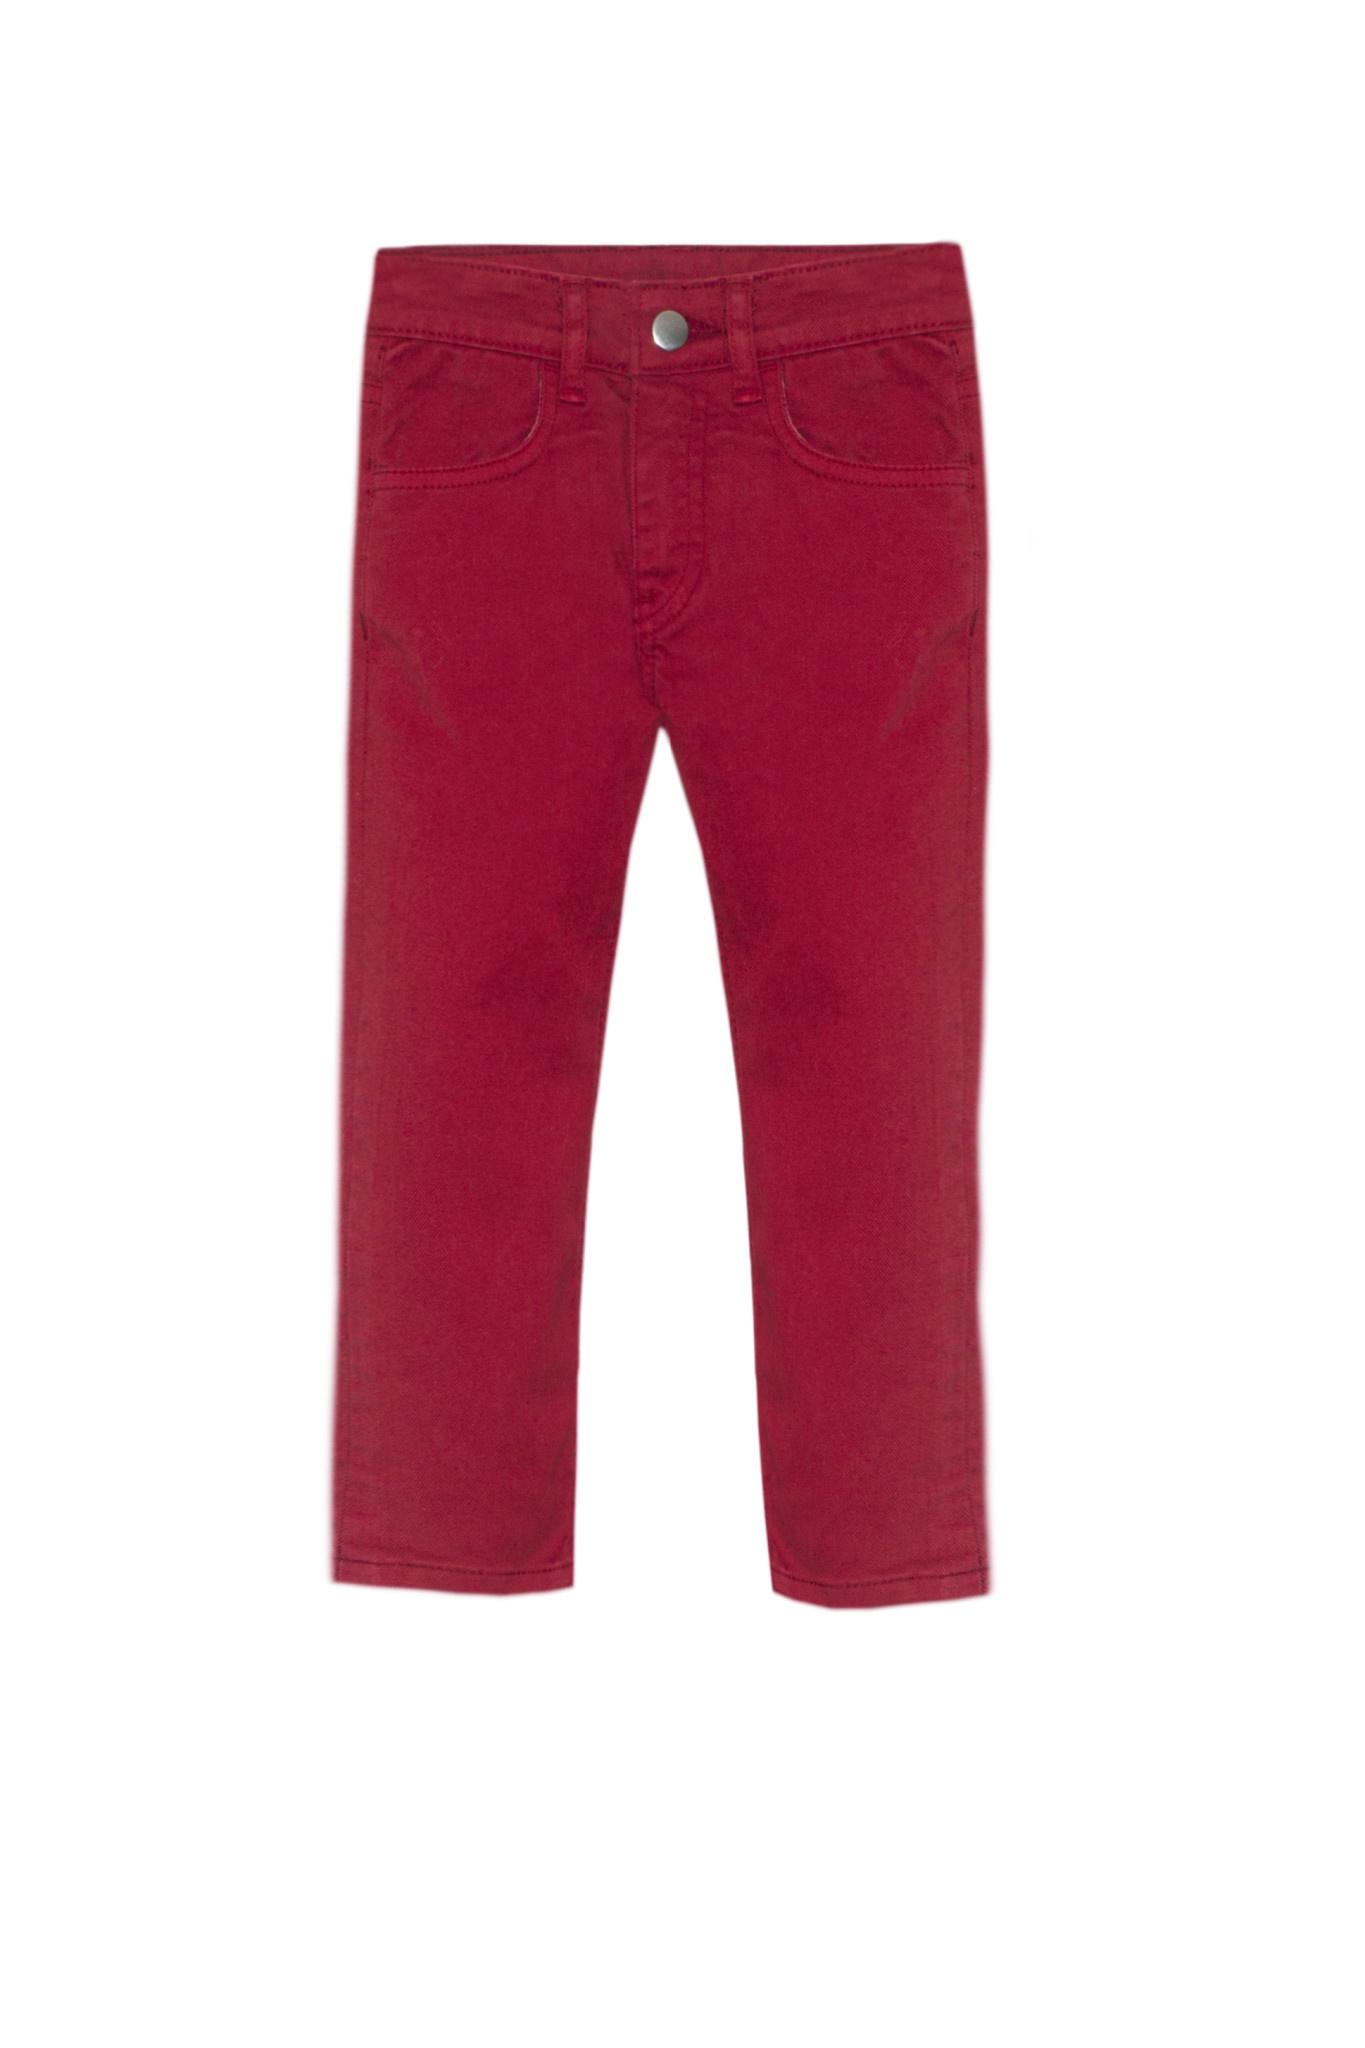 Patachou Patachou Red Boys Jeans